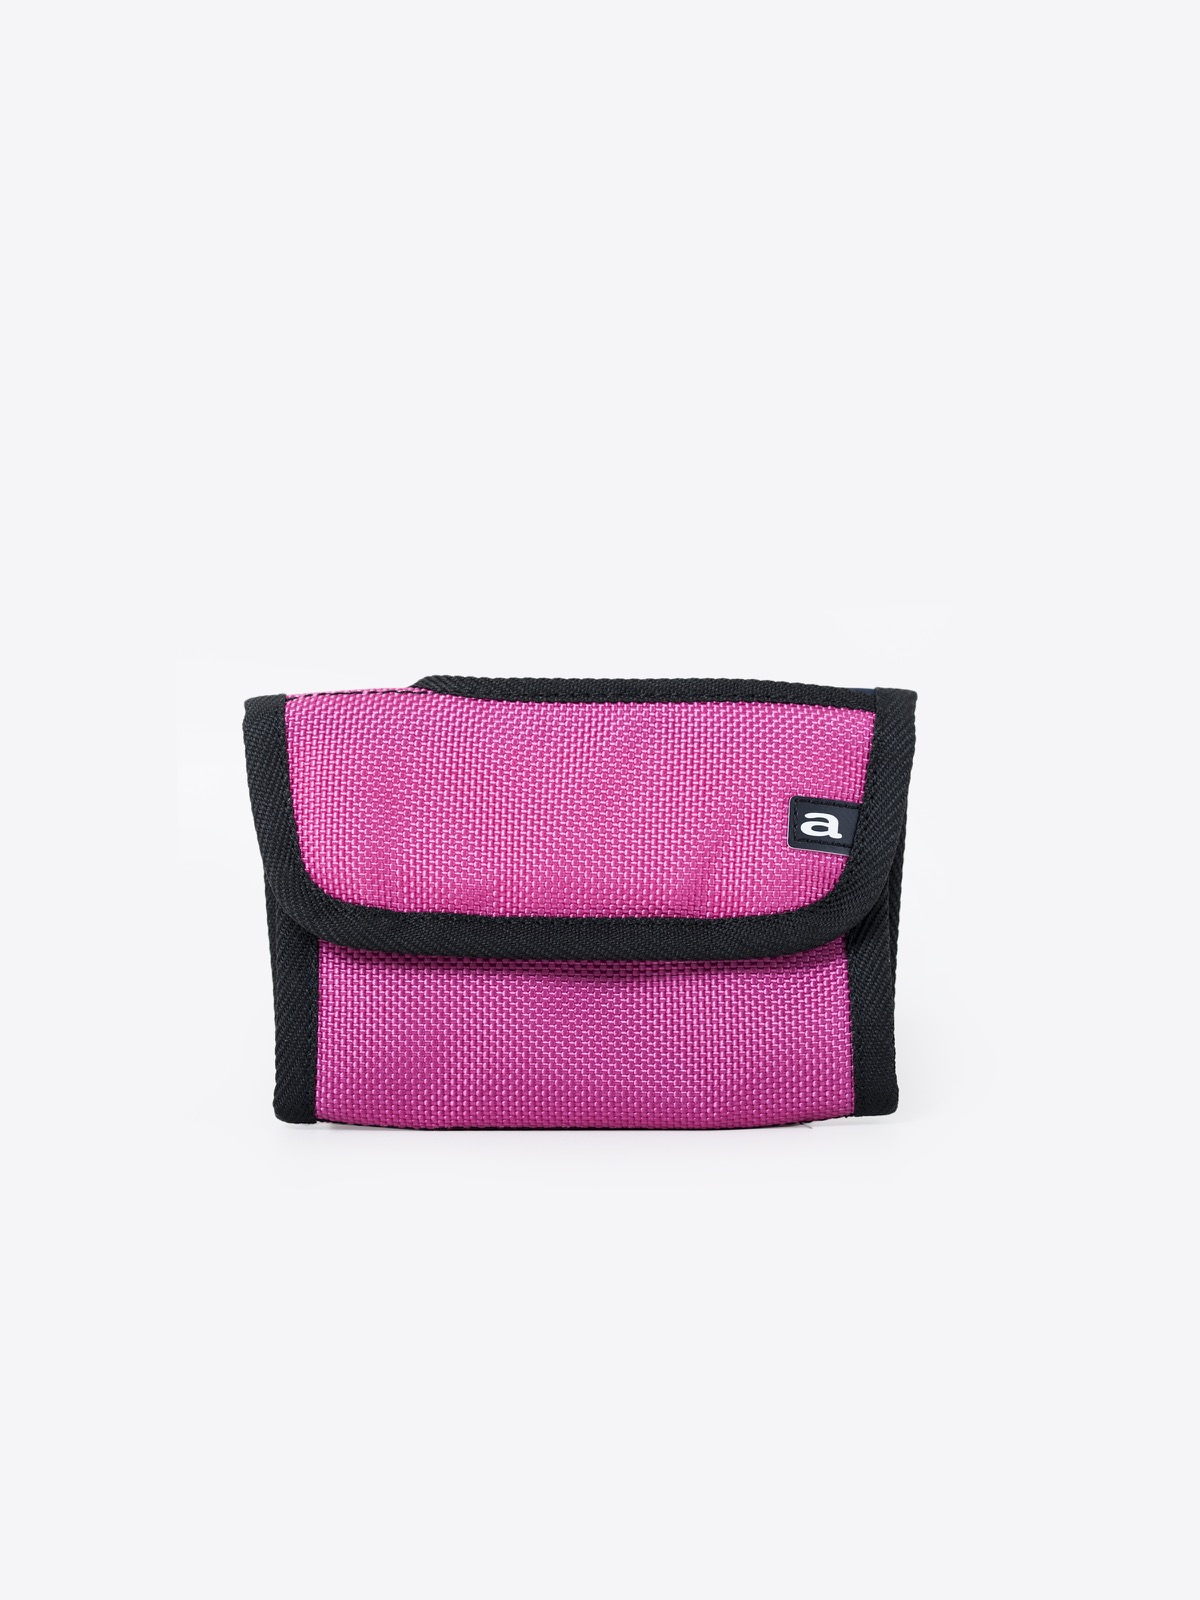 airbag craftworks palermo | 370